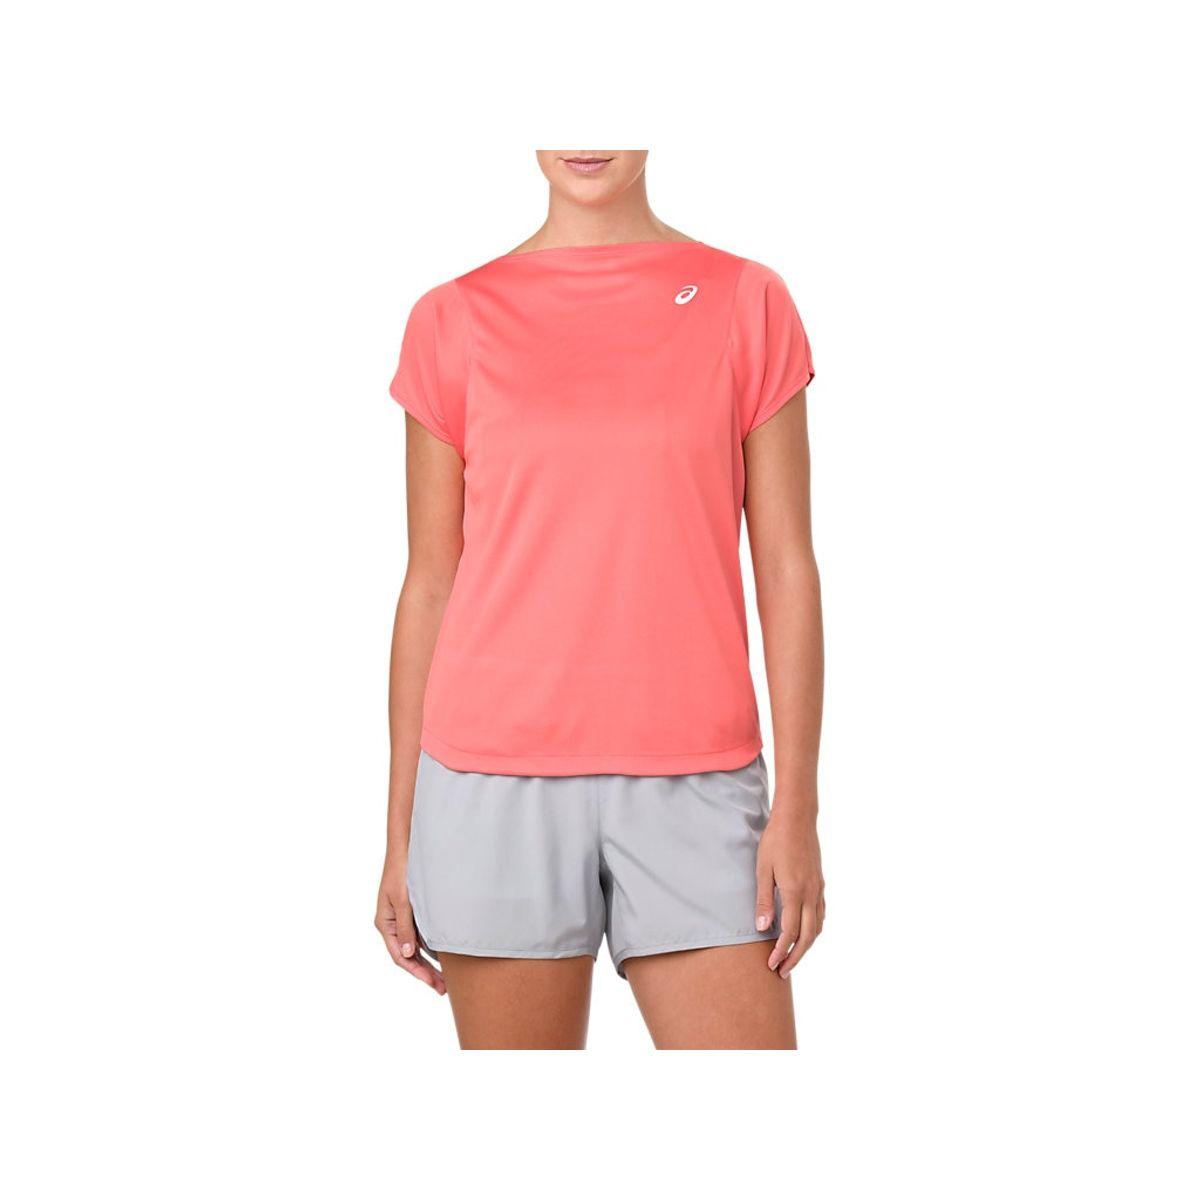 Camiseta-Asics-Practice---Feminino---Vermelho